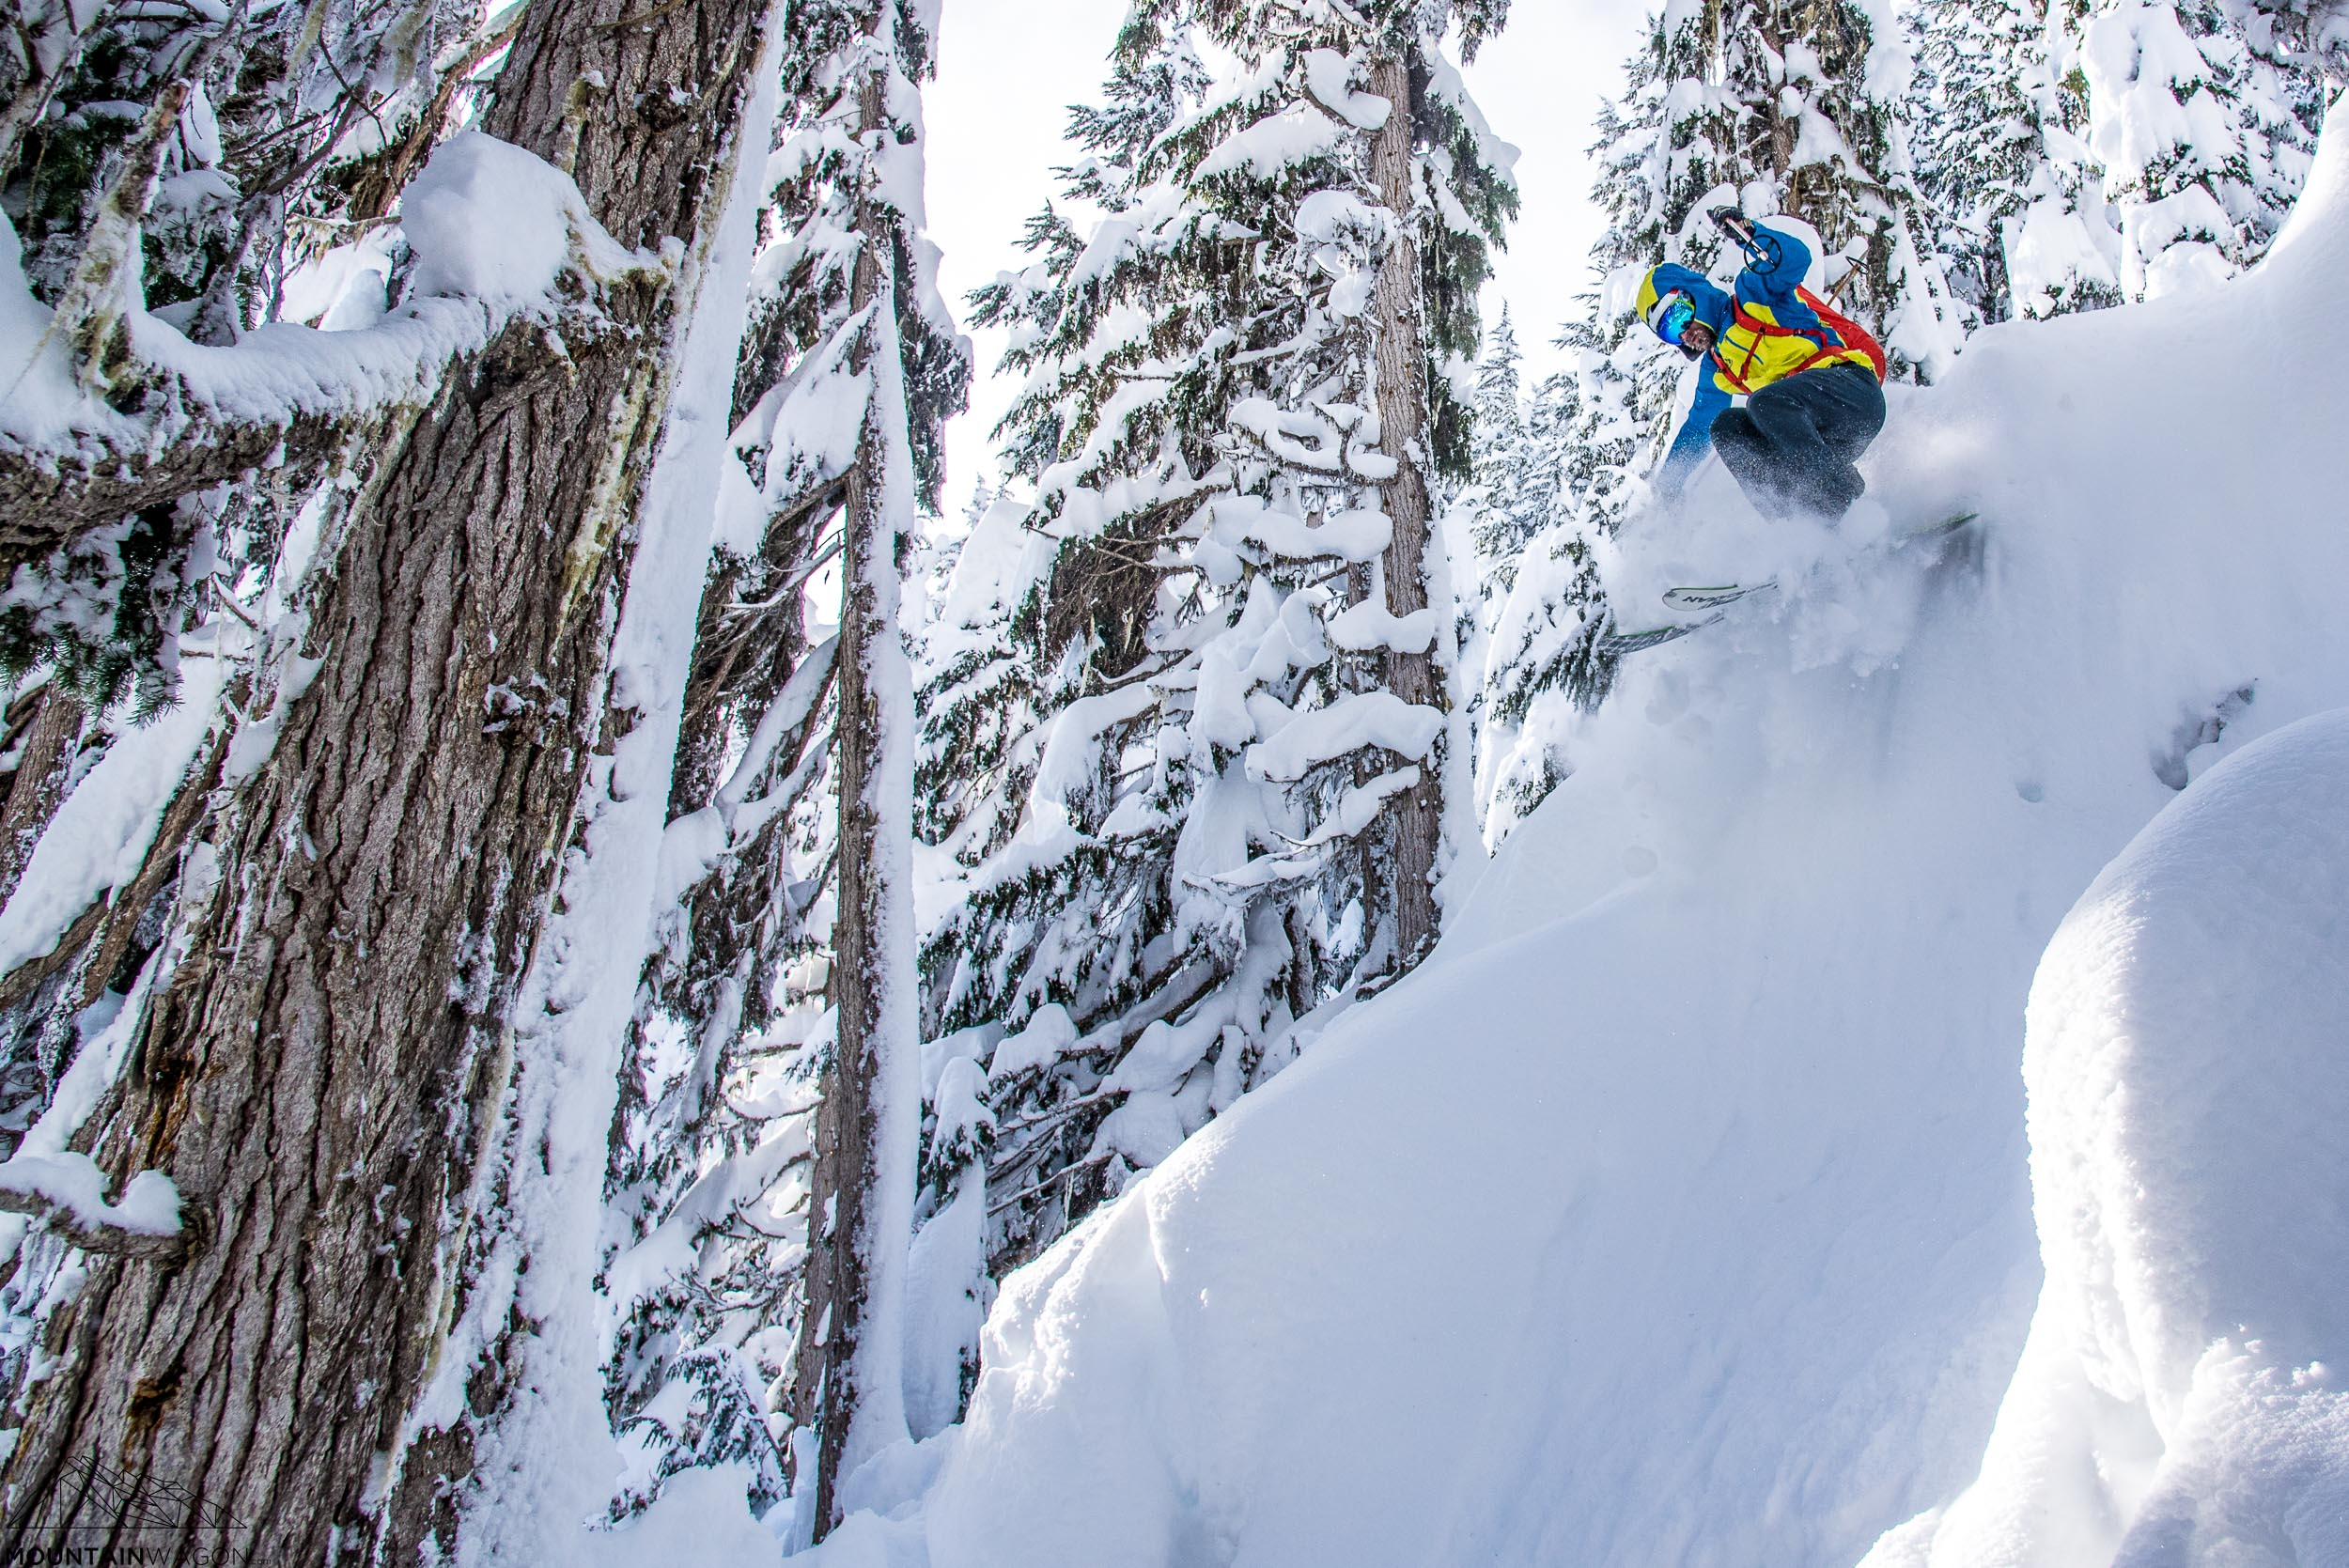 Skyler hitting a 12 foot pillow onto a rock hard ice landing. Or something.